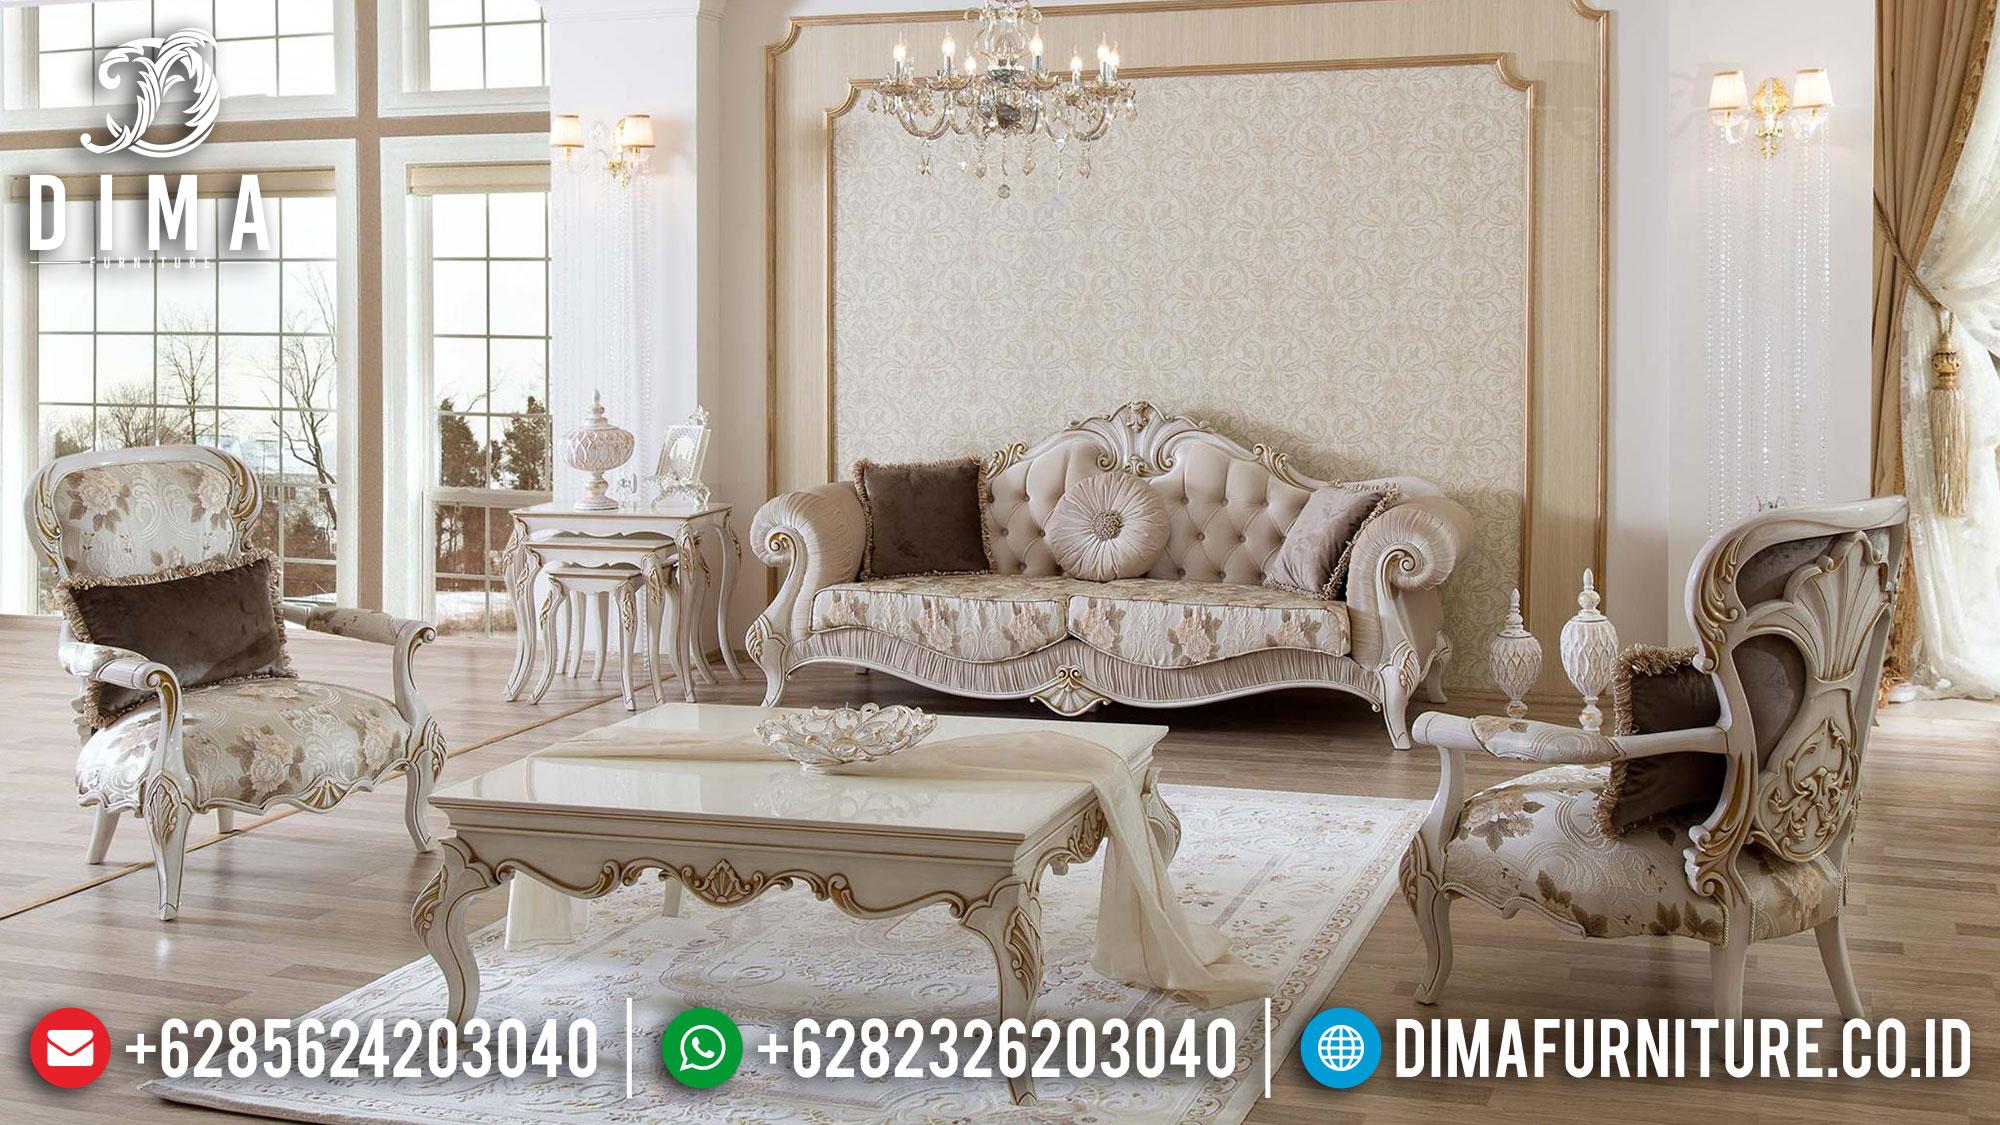 Harga Sofa Tamu Mewah Ukir Jepara Luxurious Discount Edition TTJ-1490